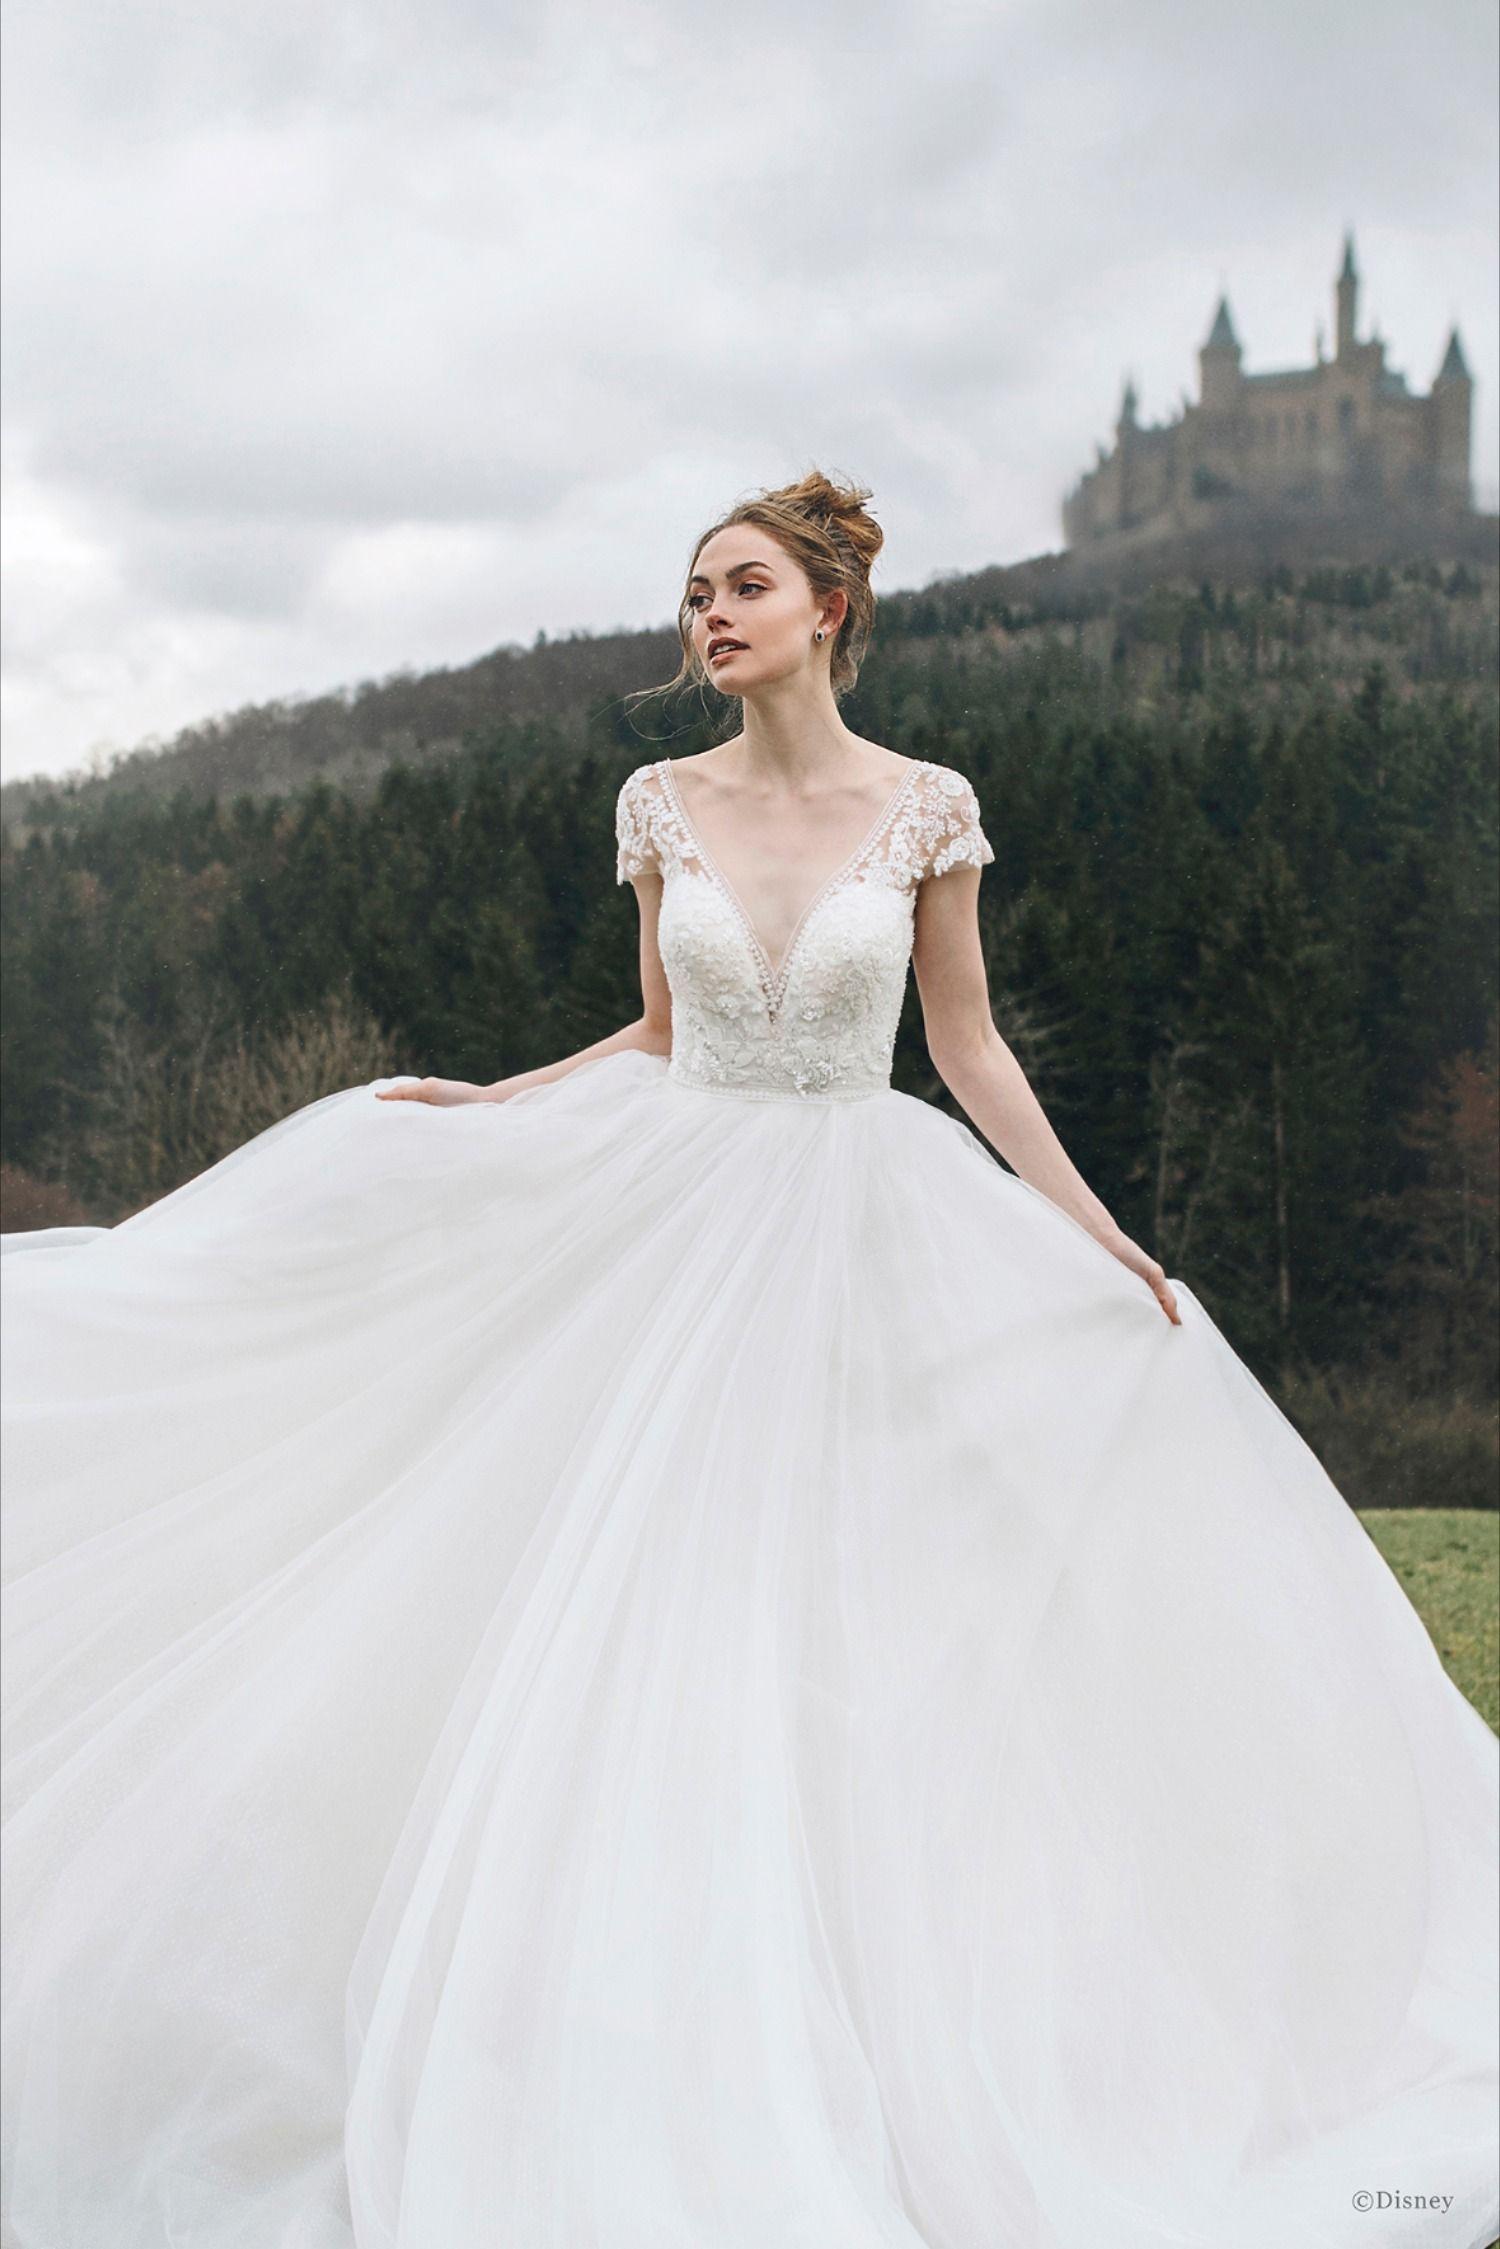 The Cinderella Wedding Gowns The Bridal Collection Wedding Dresses Cinderella Disney Wedding Dresses Allure Bridal [ 2249 x 1500 Pixel ]